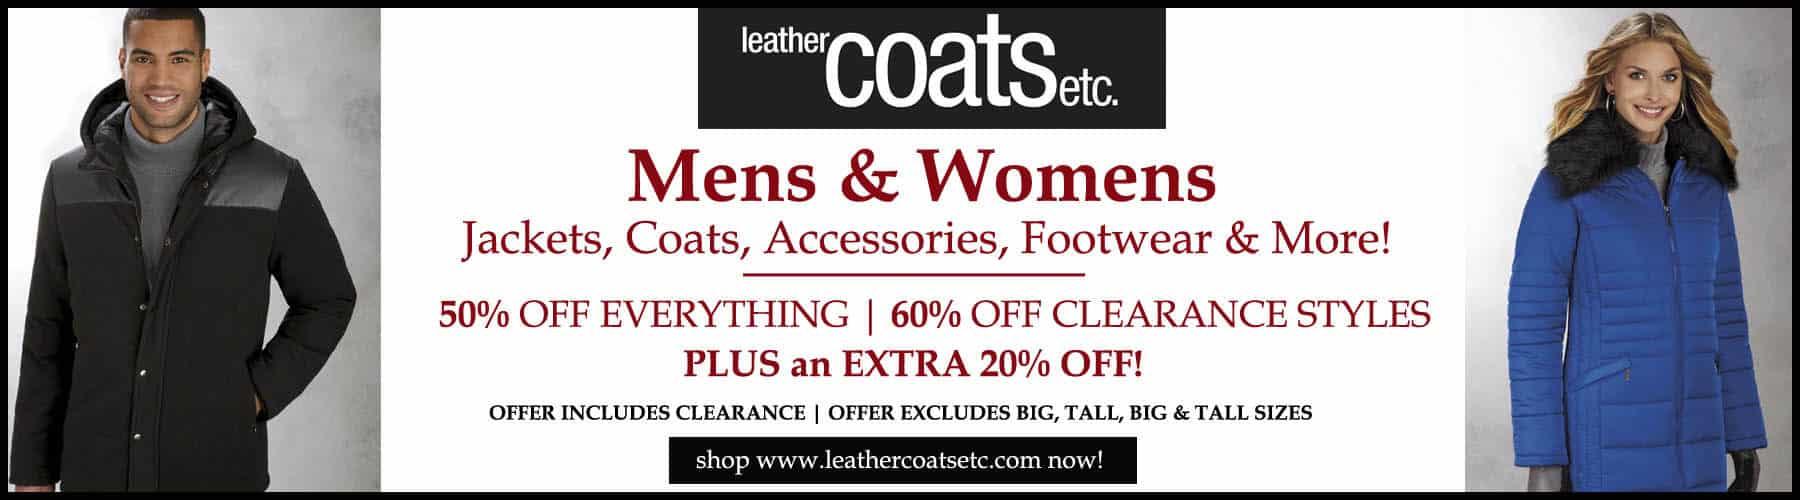 Black Friday Leather Coats Deals